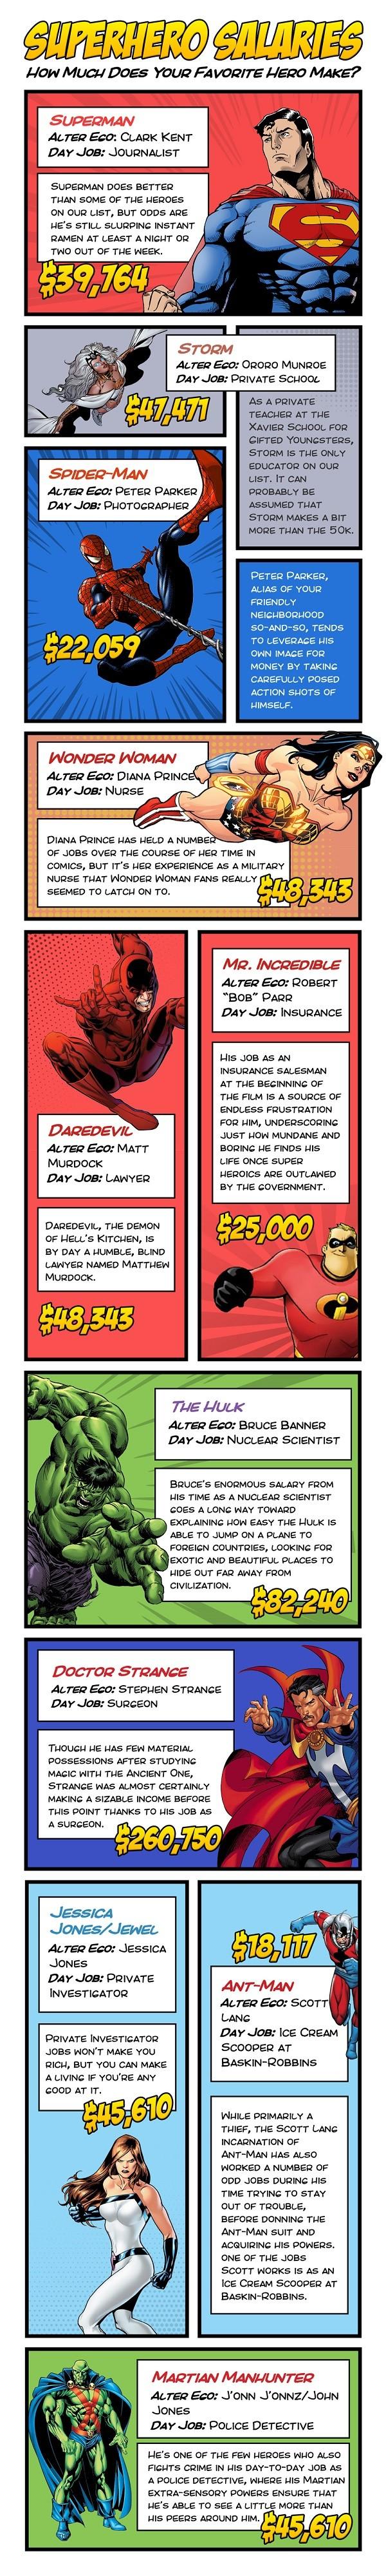 SuperheroDayJobInfographic.jpg